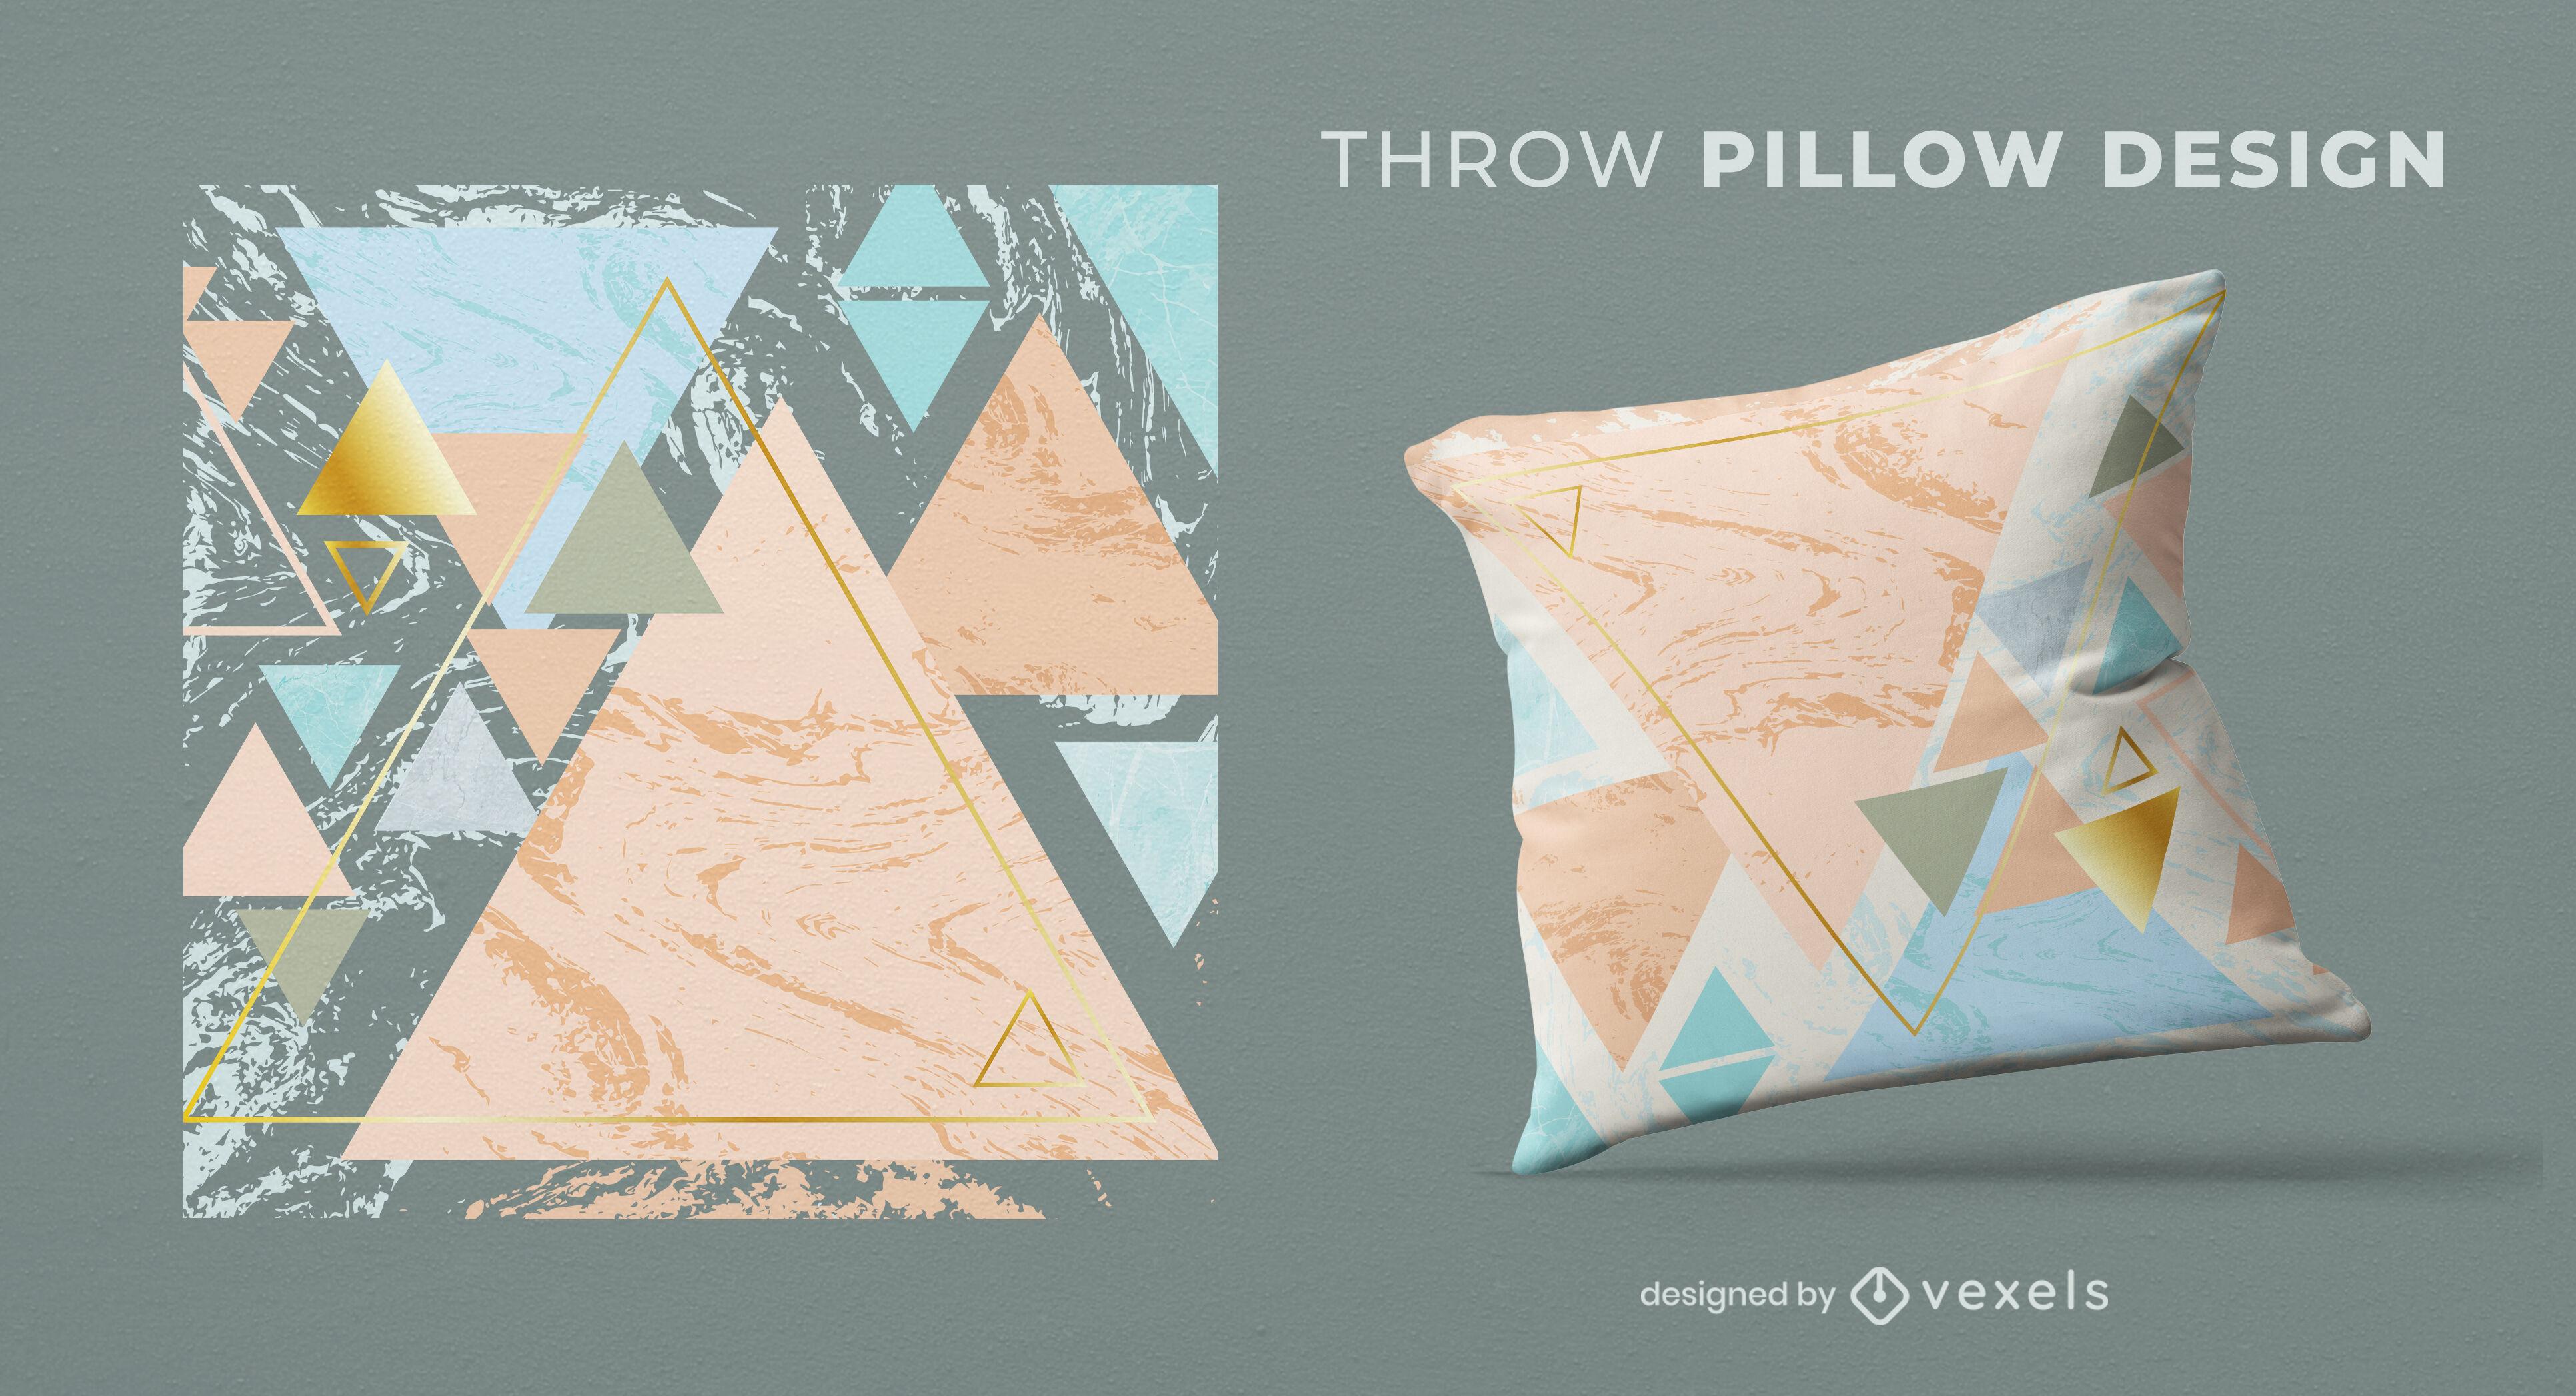 Geometric abstract pillow design